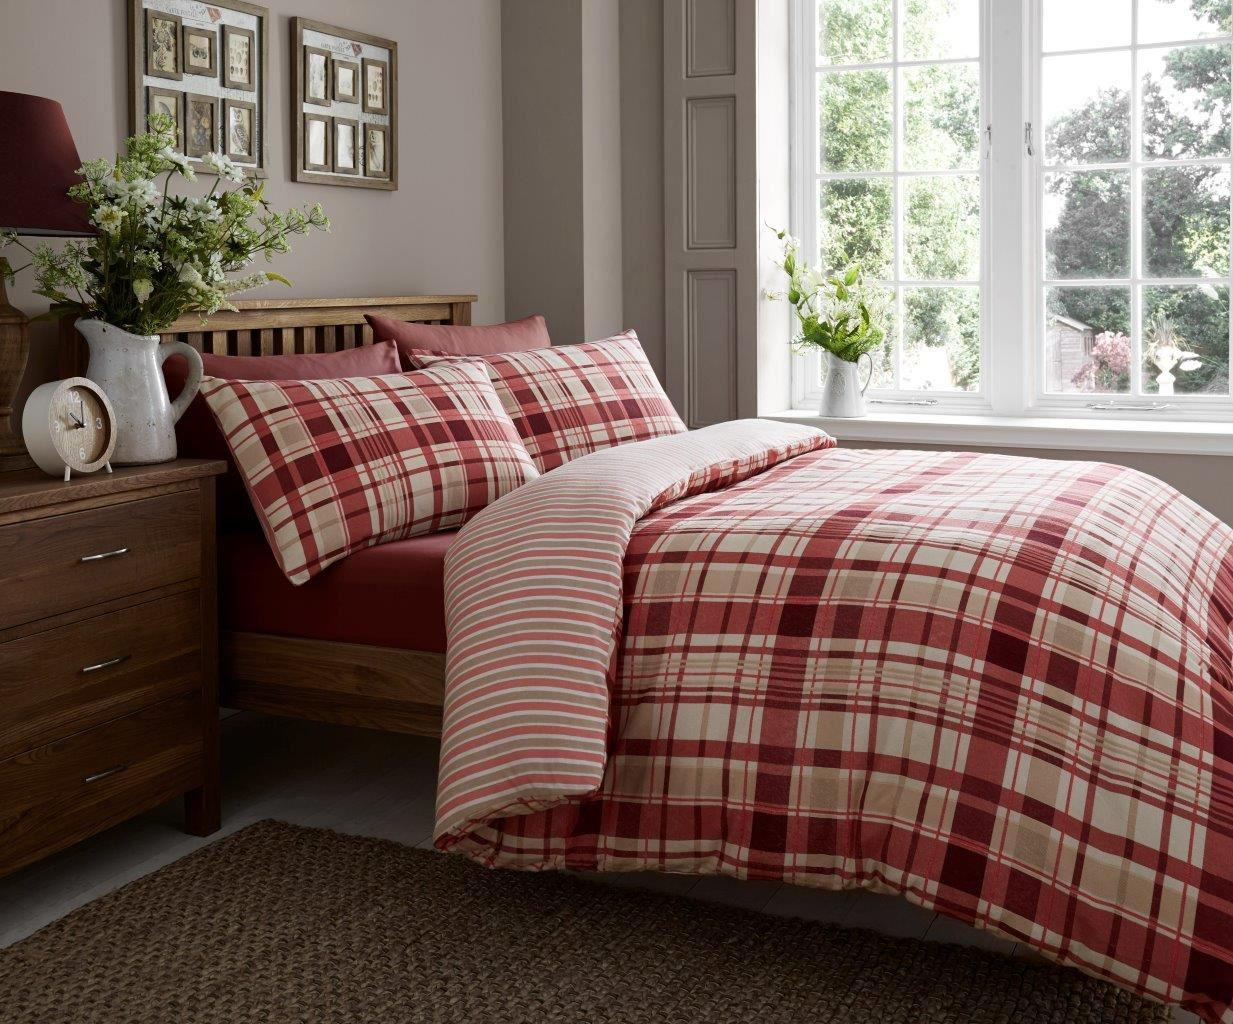 Flannelette Luxury 100% Brushed Cotton Duvet Cover & Pillowcase Bed Set